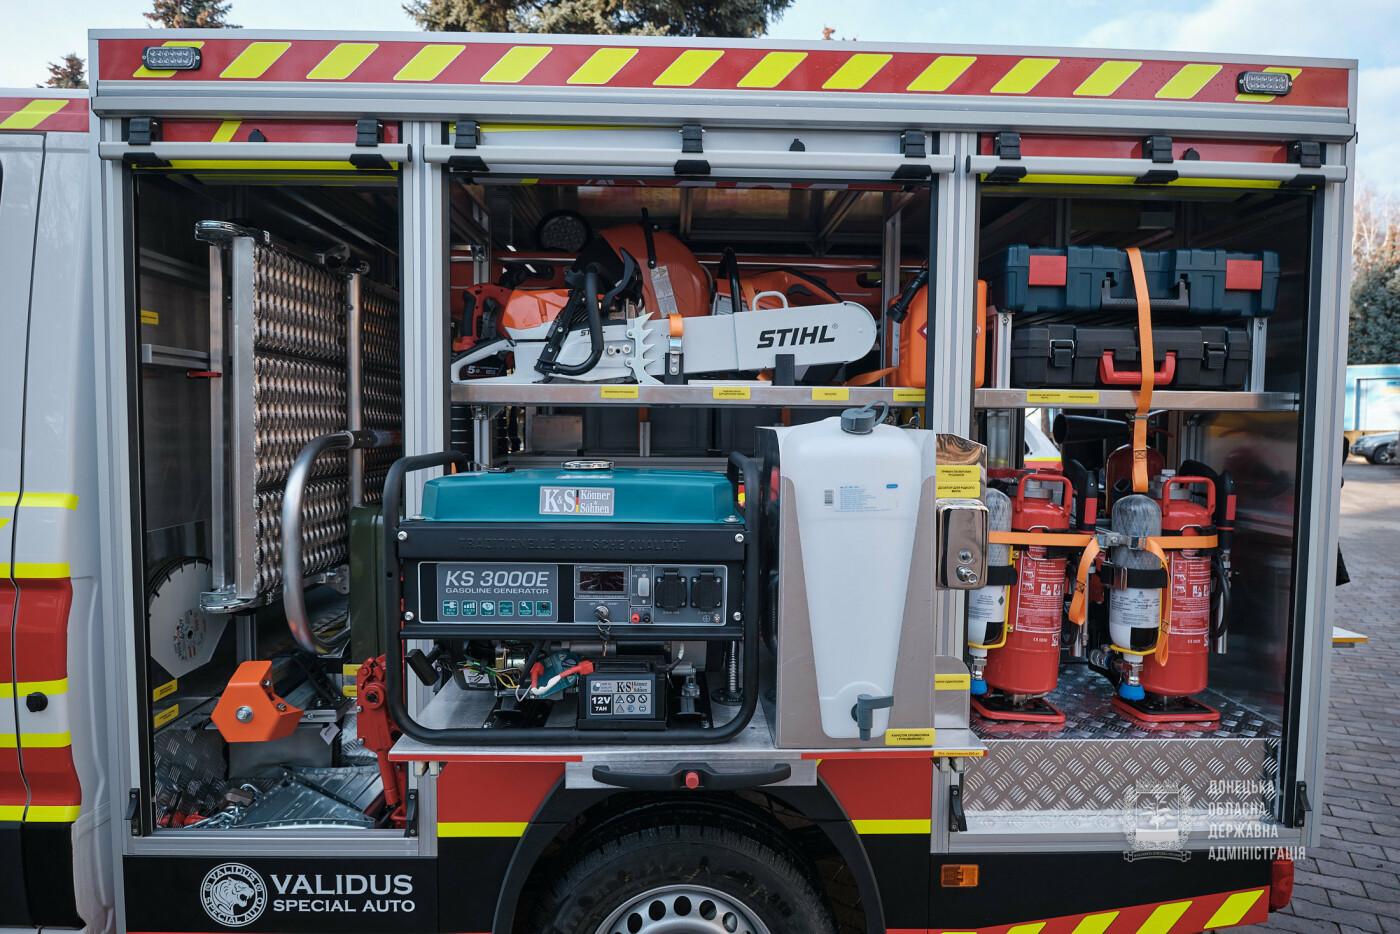 Слов'янські рятувальники отримали нову пожежну автоцистерну, фото-10